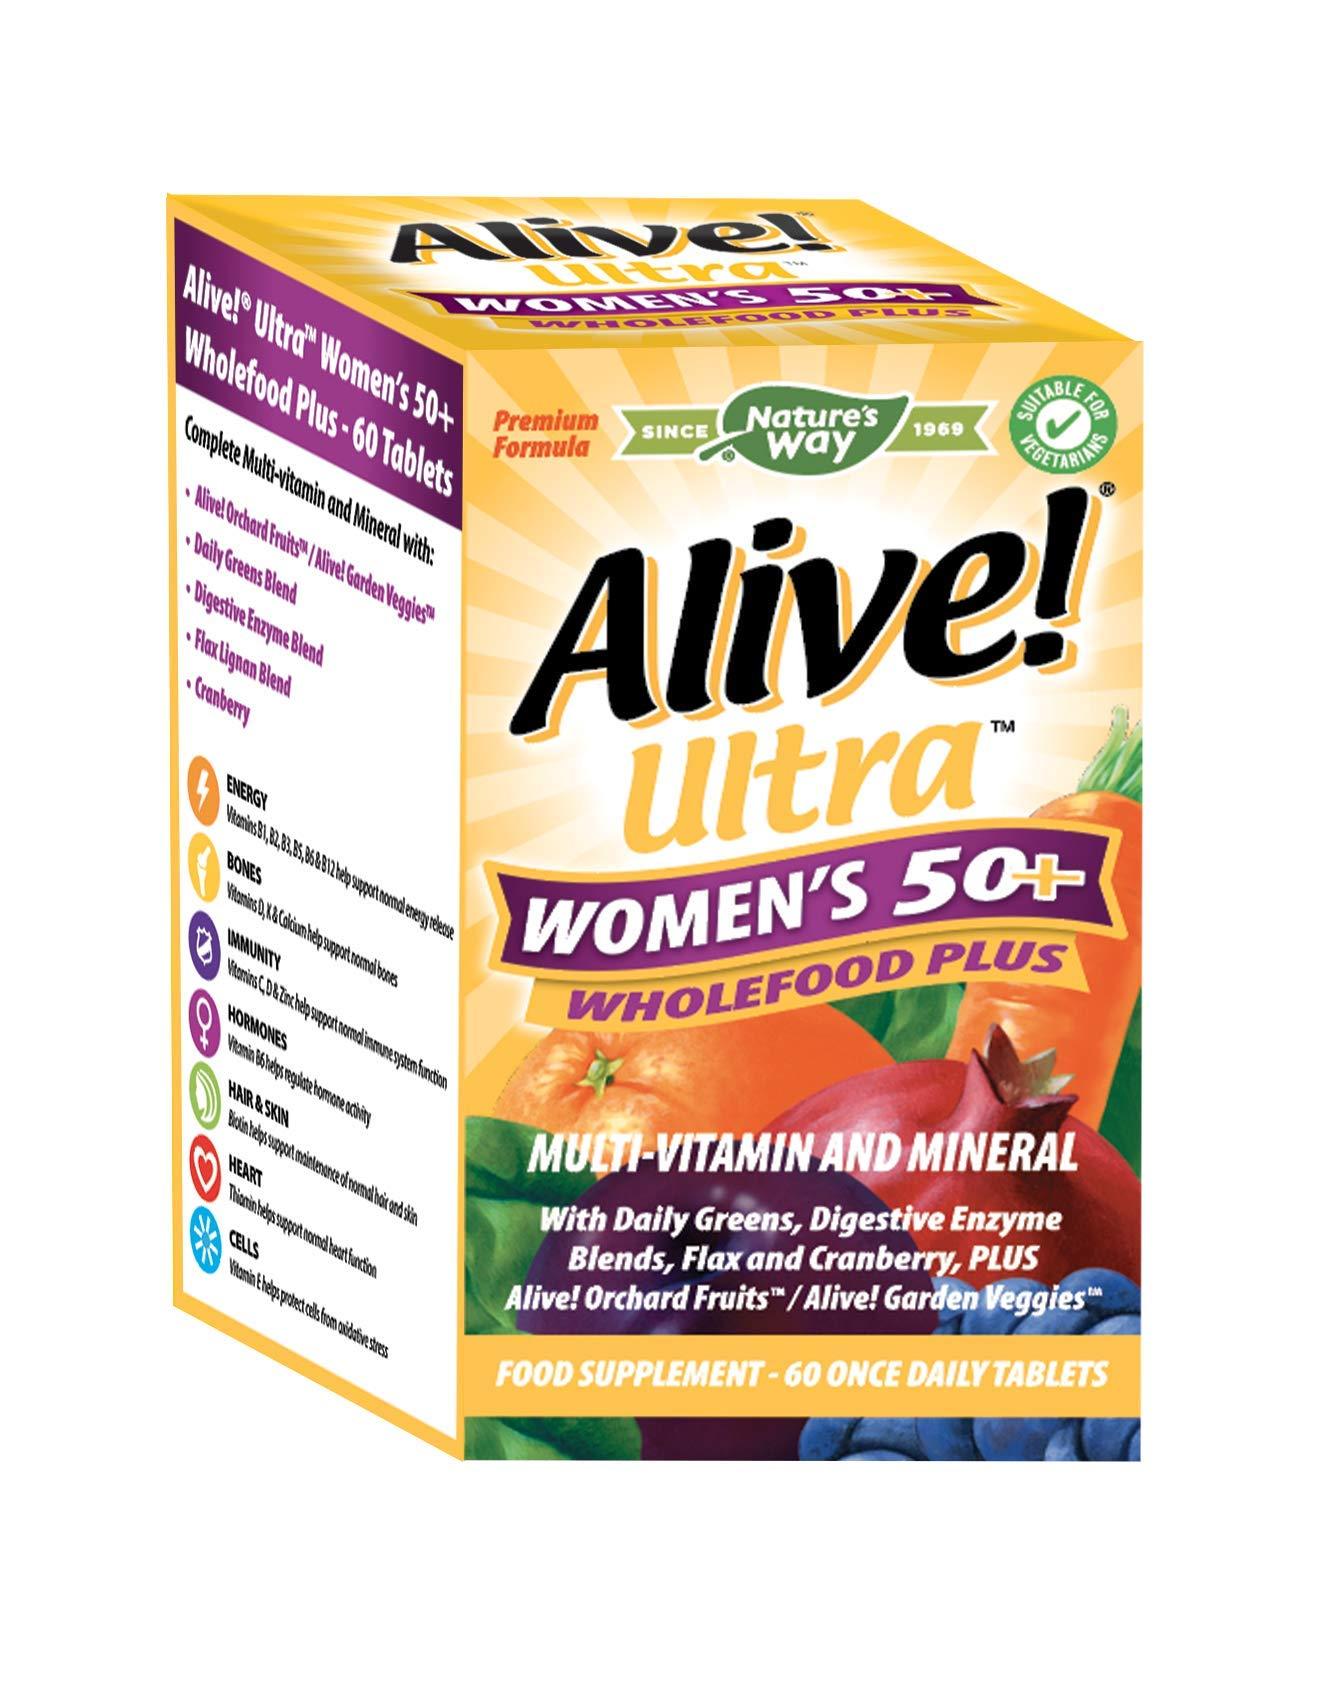 Alive! Ultra Women's 50+ Wholefood Plus Multivitamins - 60 Tablets